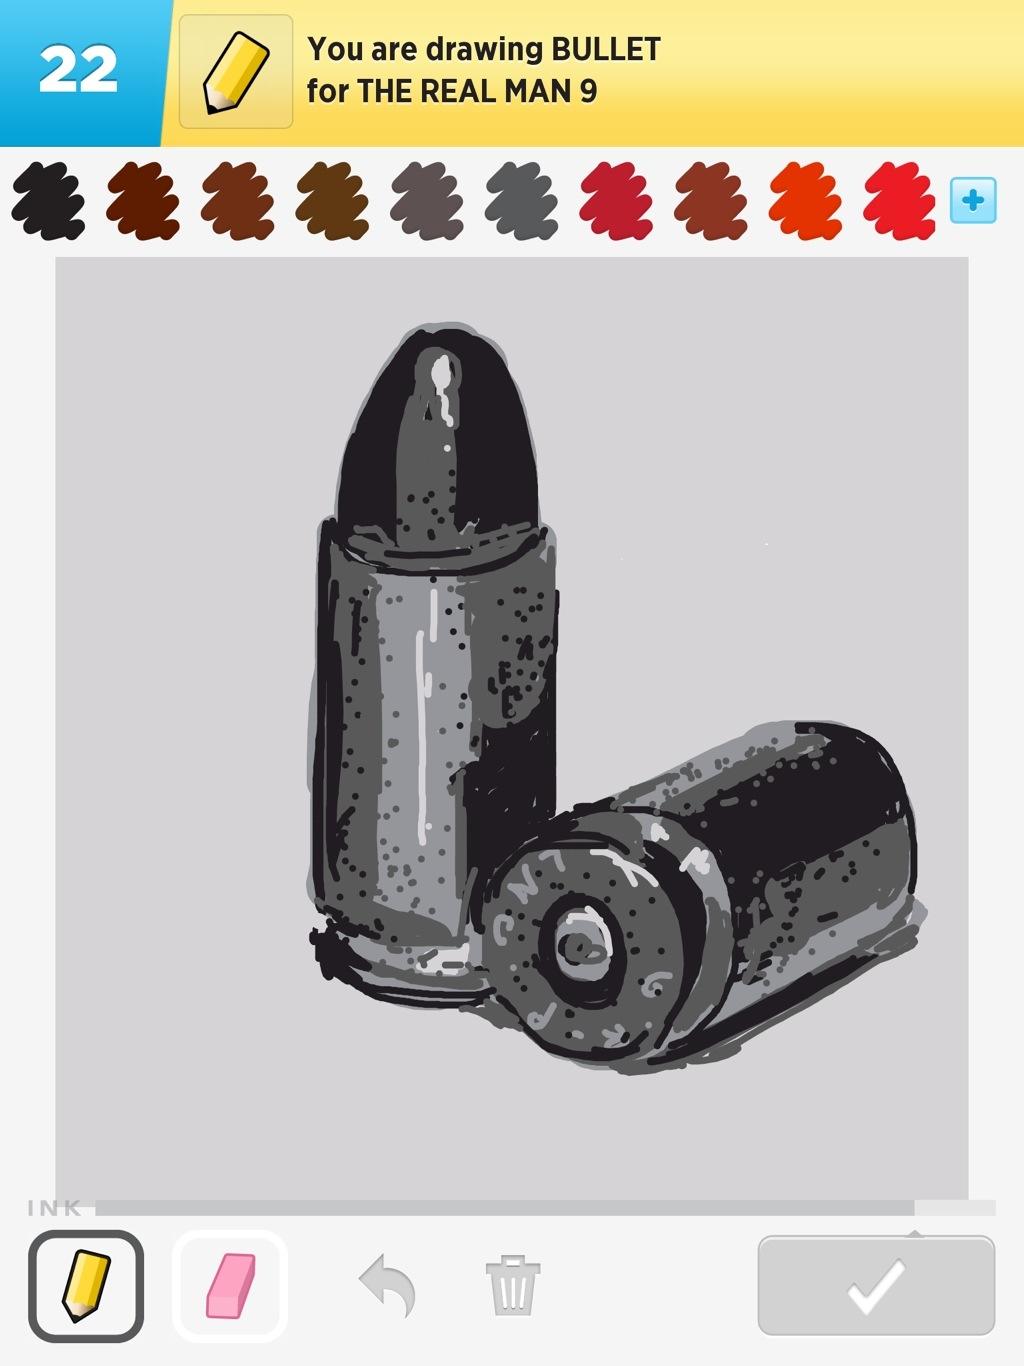 Drawn bullet Bullet Some Things I've Drawn